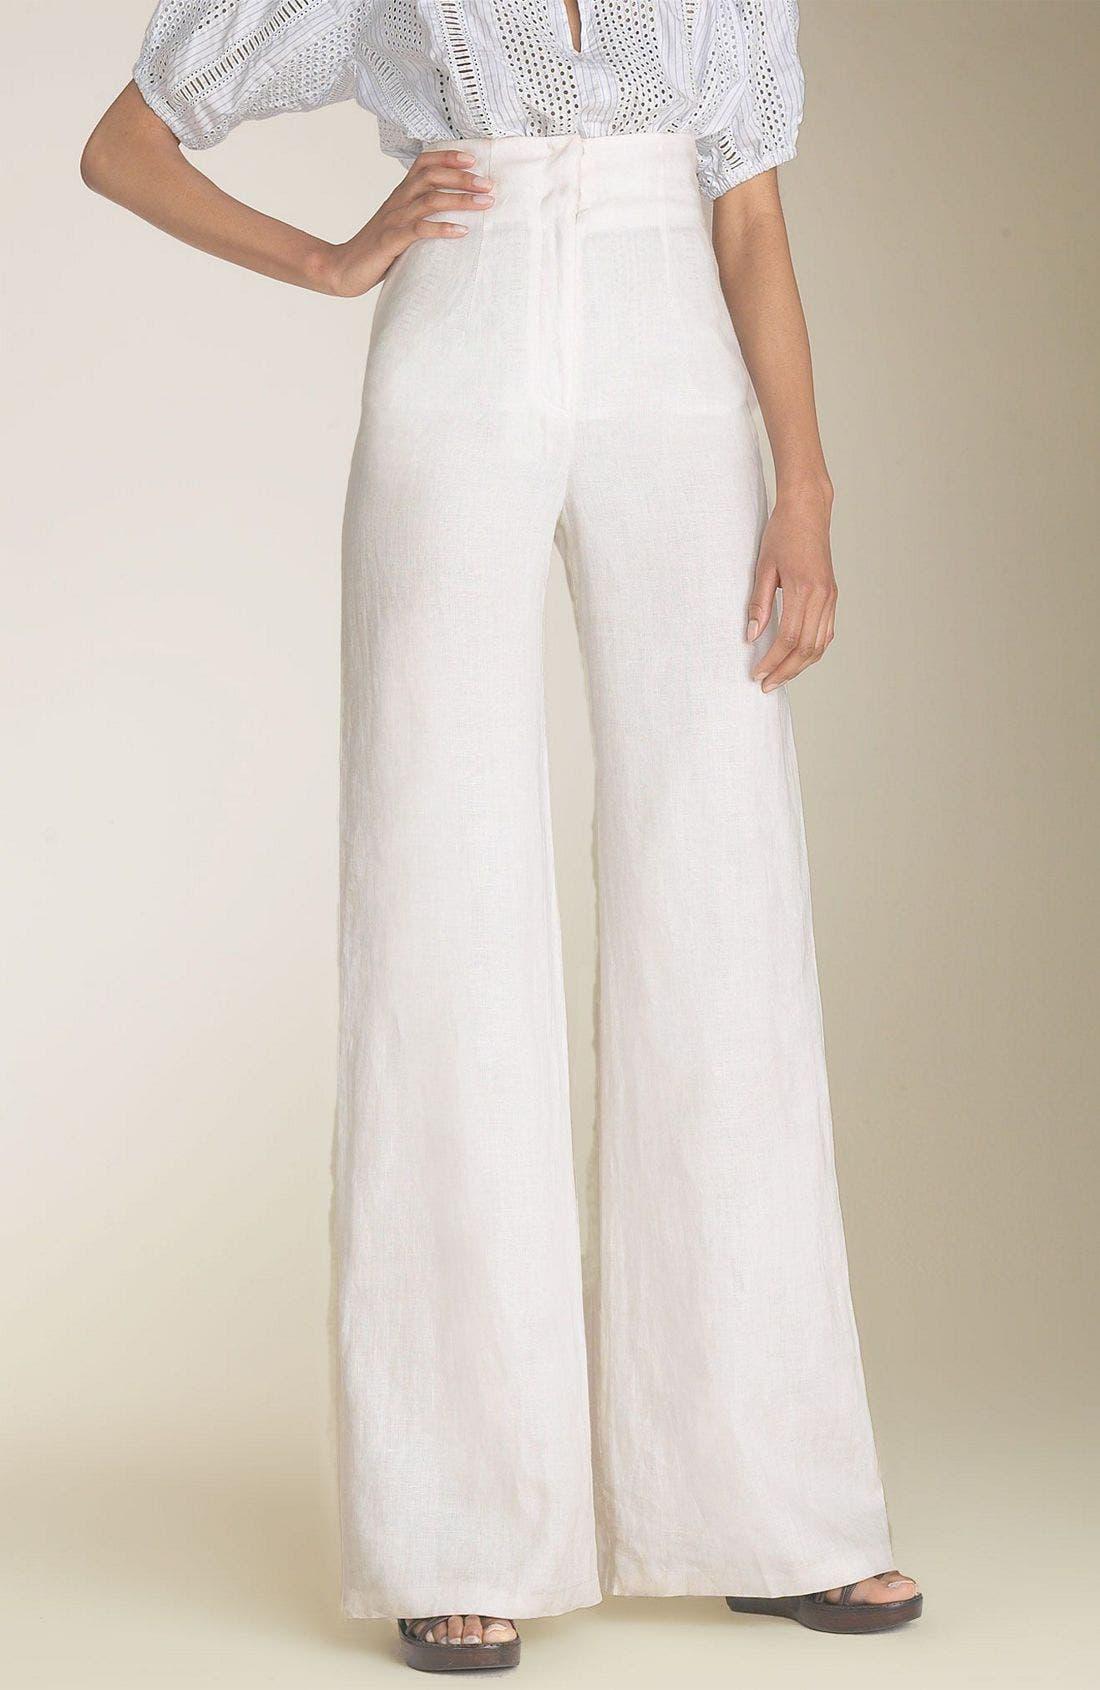 Main Image - Organic John Patrick High Waist Crinkled Linen Pants